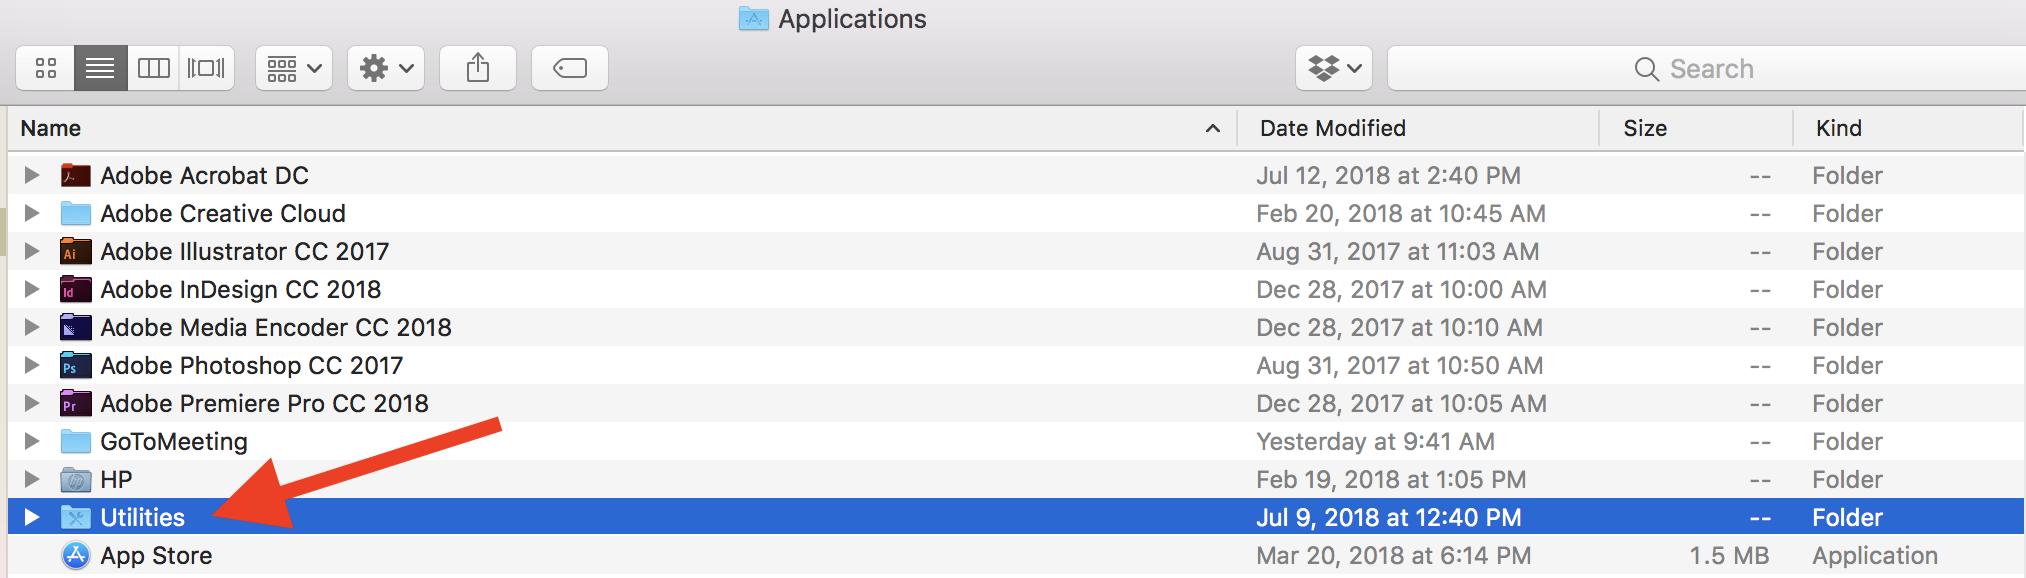 find-utilities-folder-on-a-mac